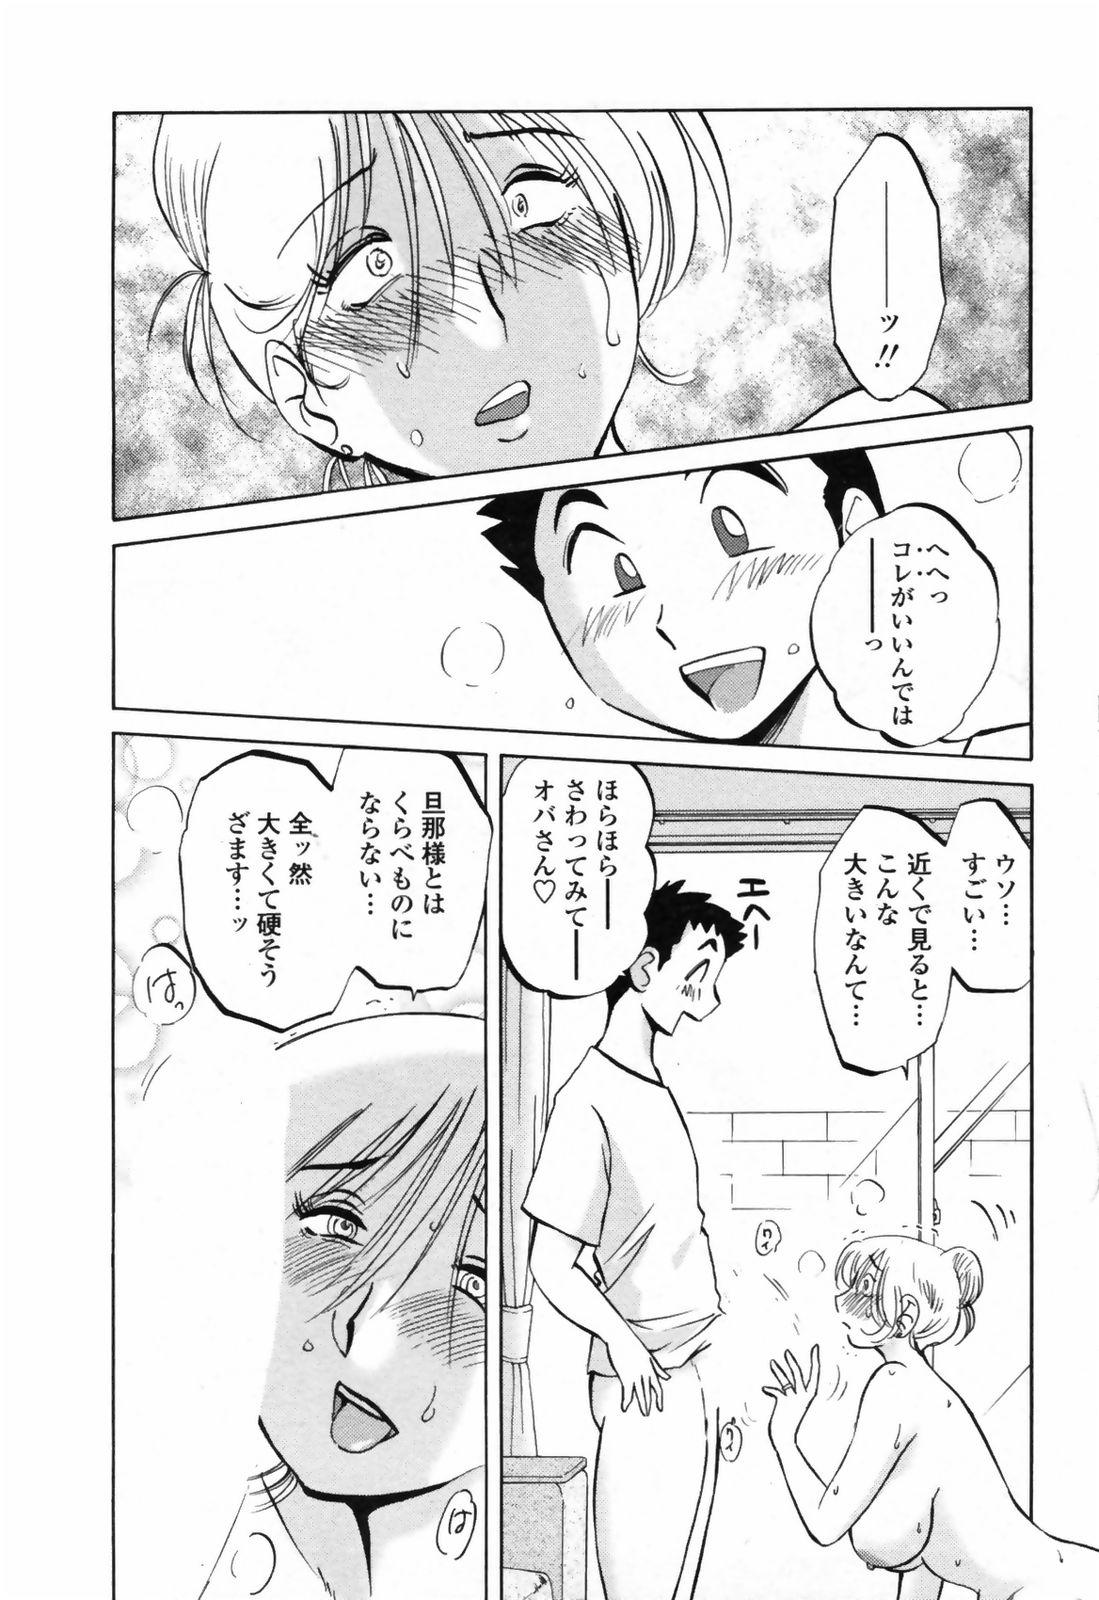 [Tsuyatsuya] Azumi-kun to Issho chapt.1-5 (Comic Penguin Club) 53